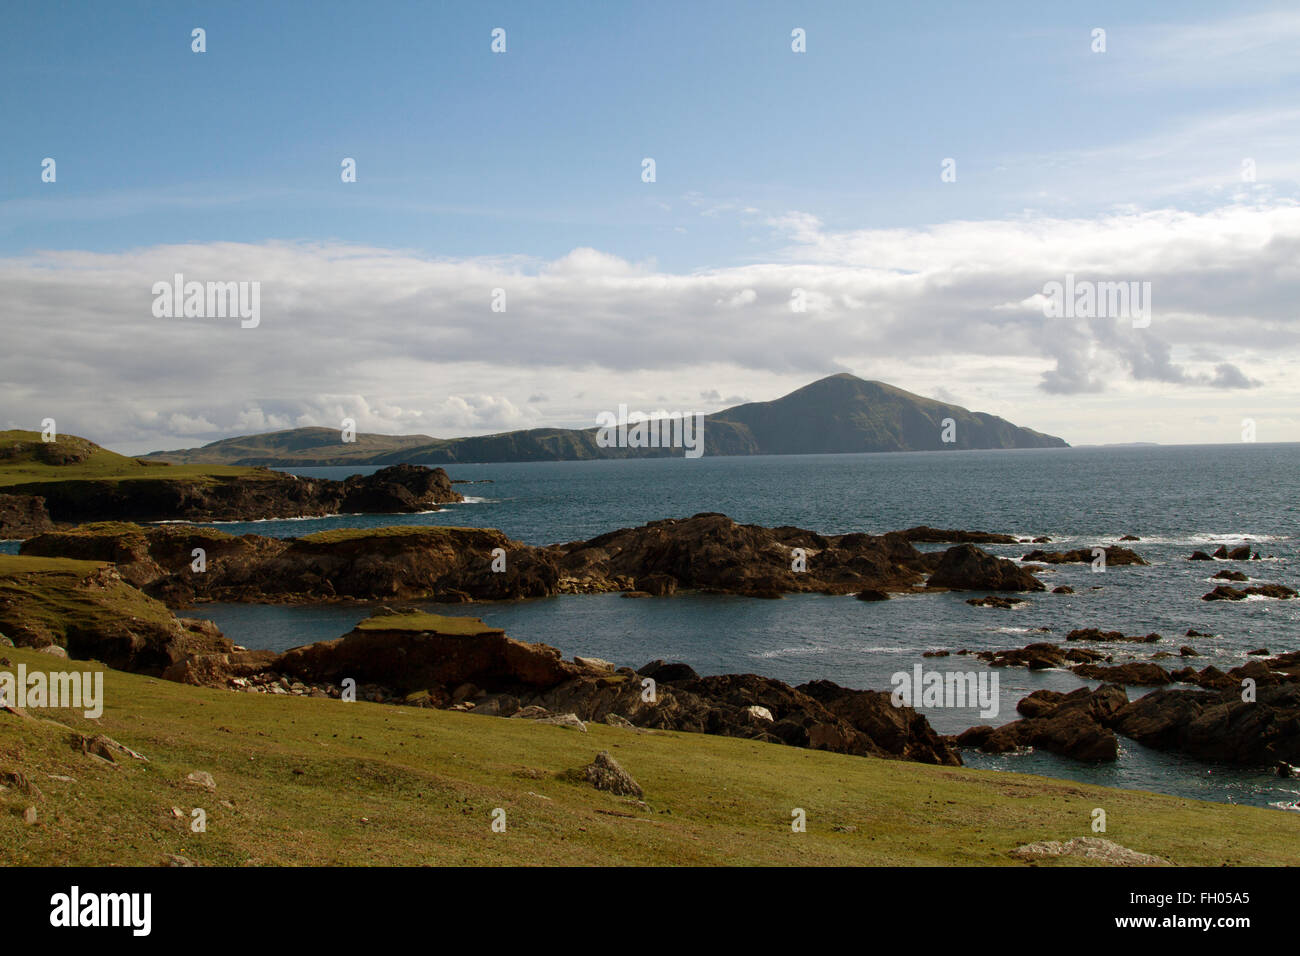 Achill, Co. Mayo, Ireland - Stock Image